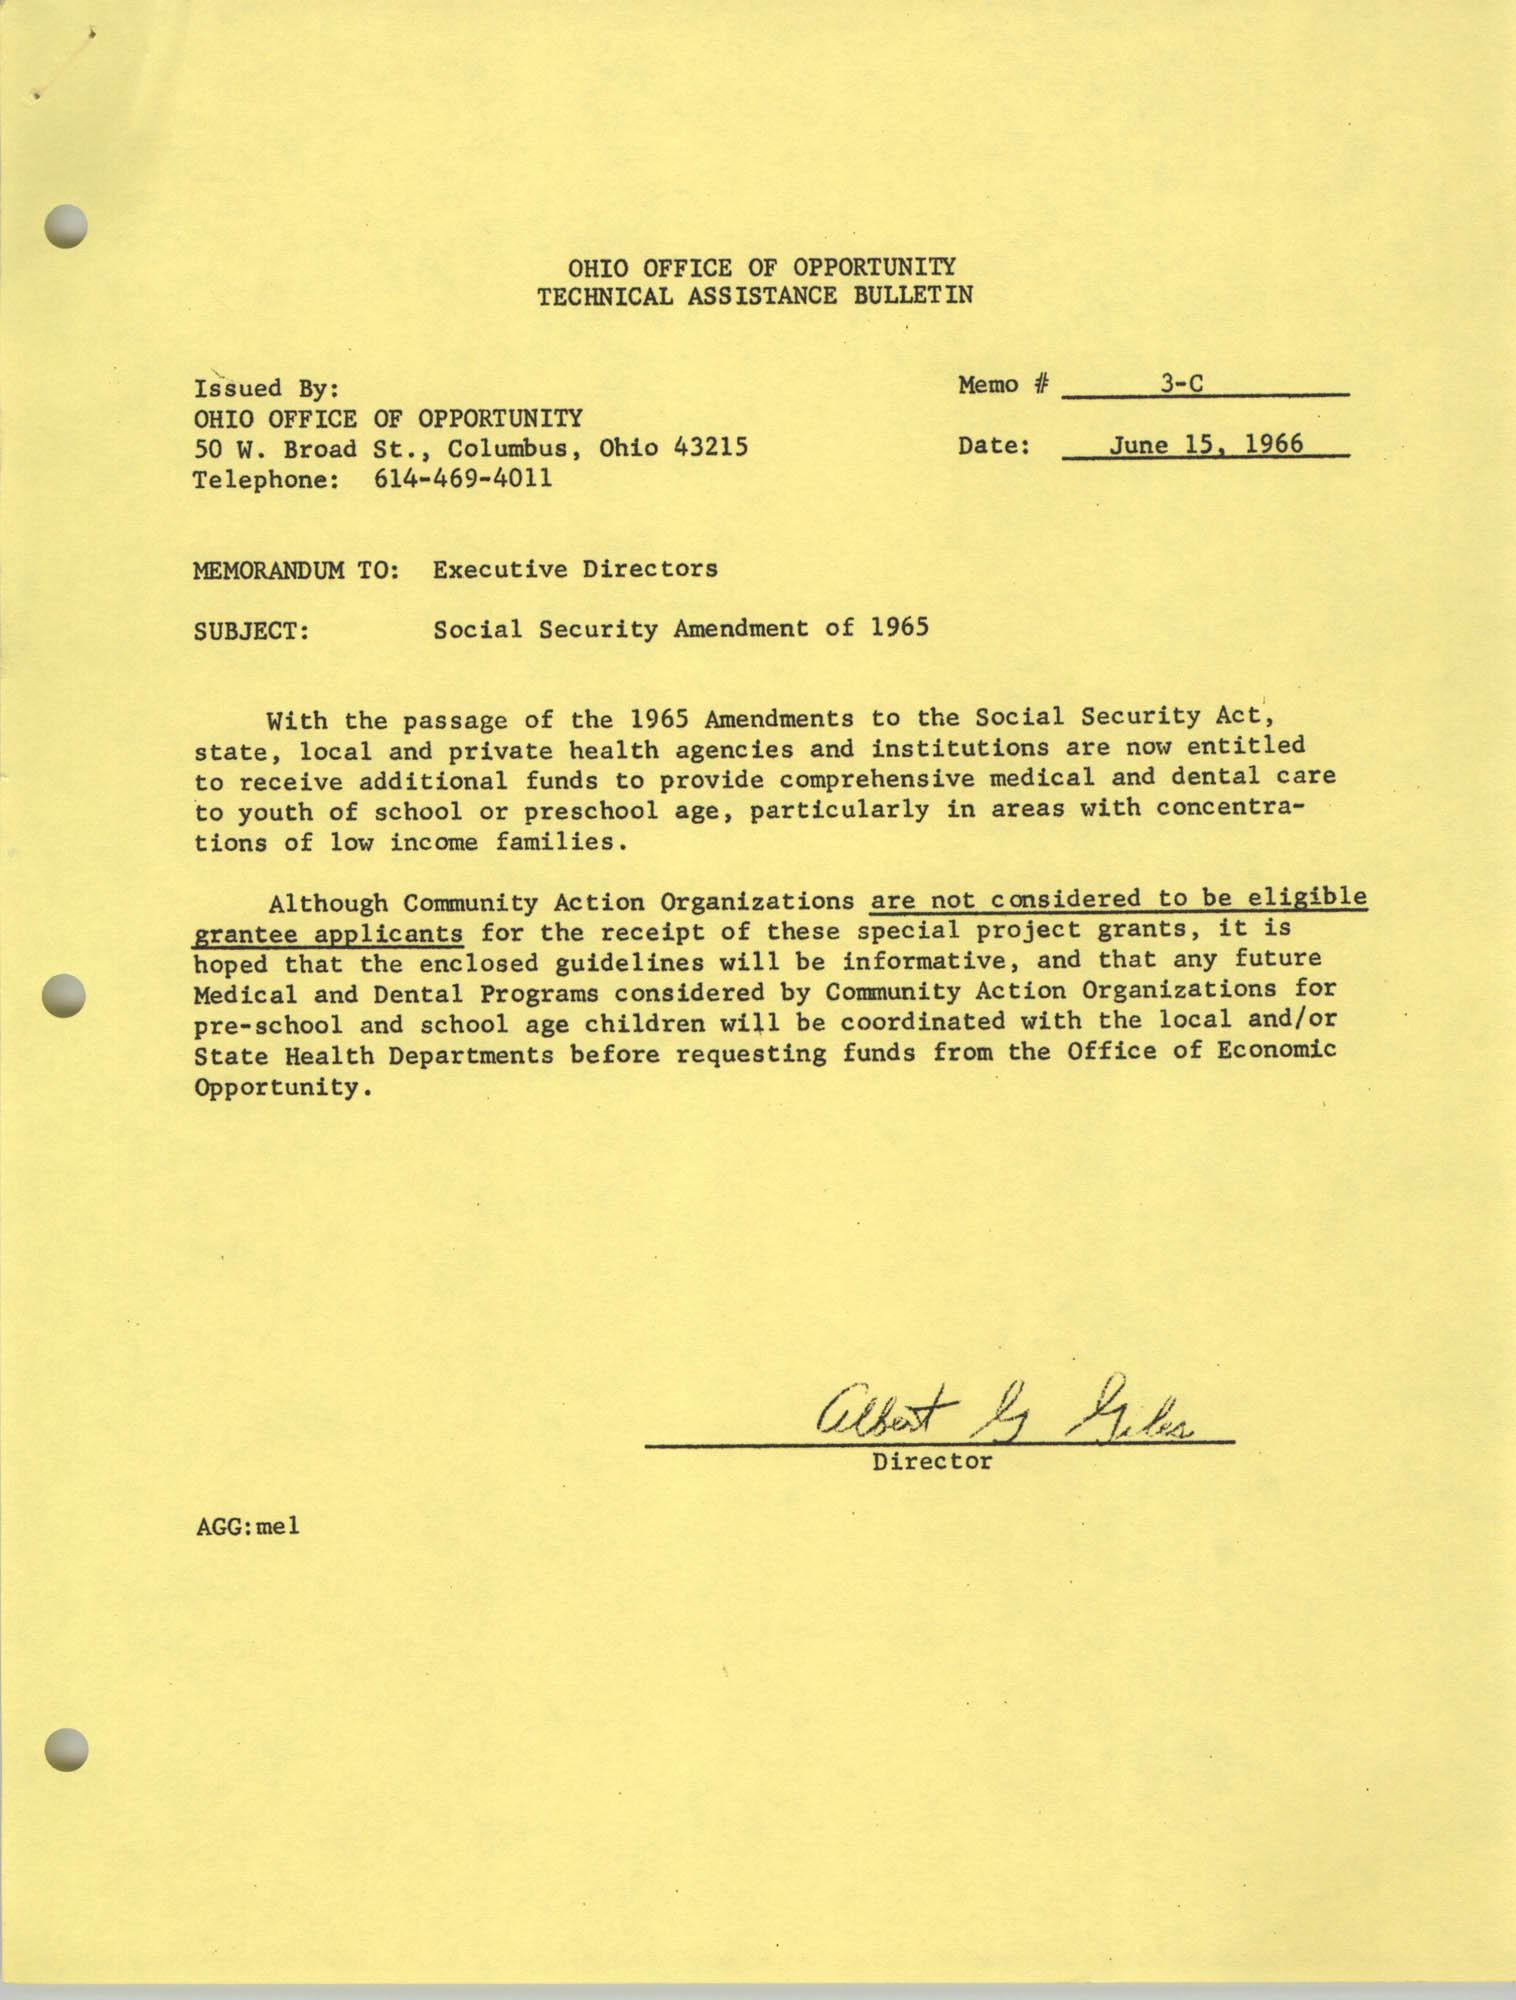 Ohio Office of Opportunity Technical Assistance Bulletin, Memorandum 3-C